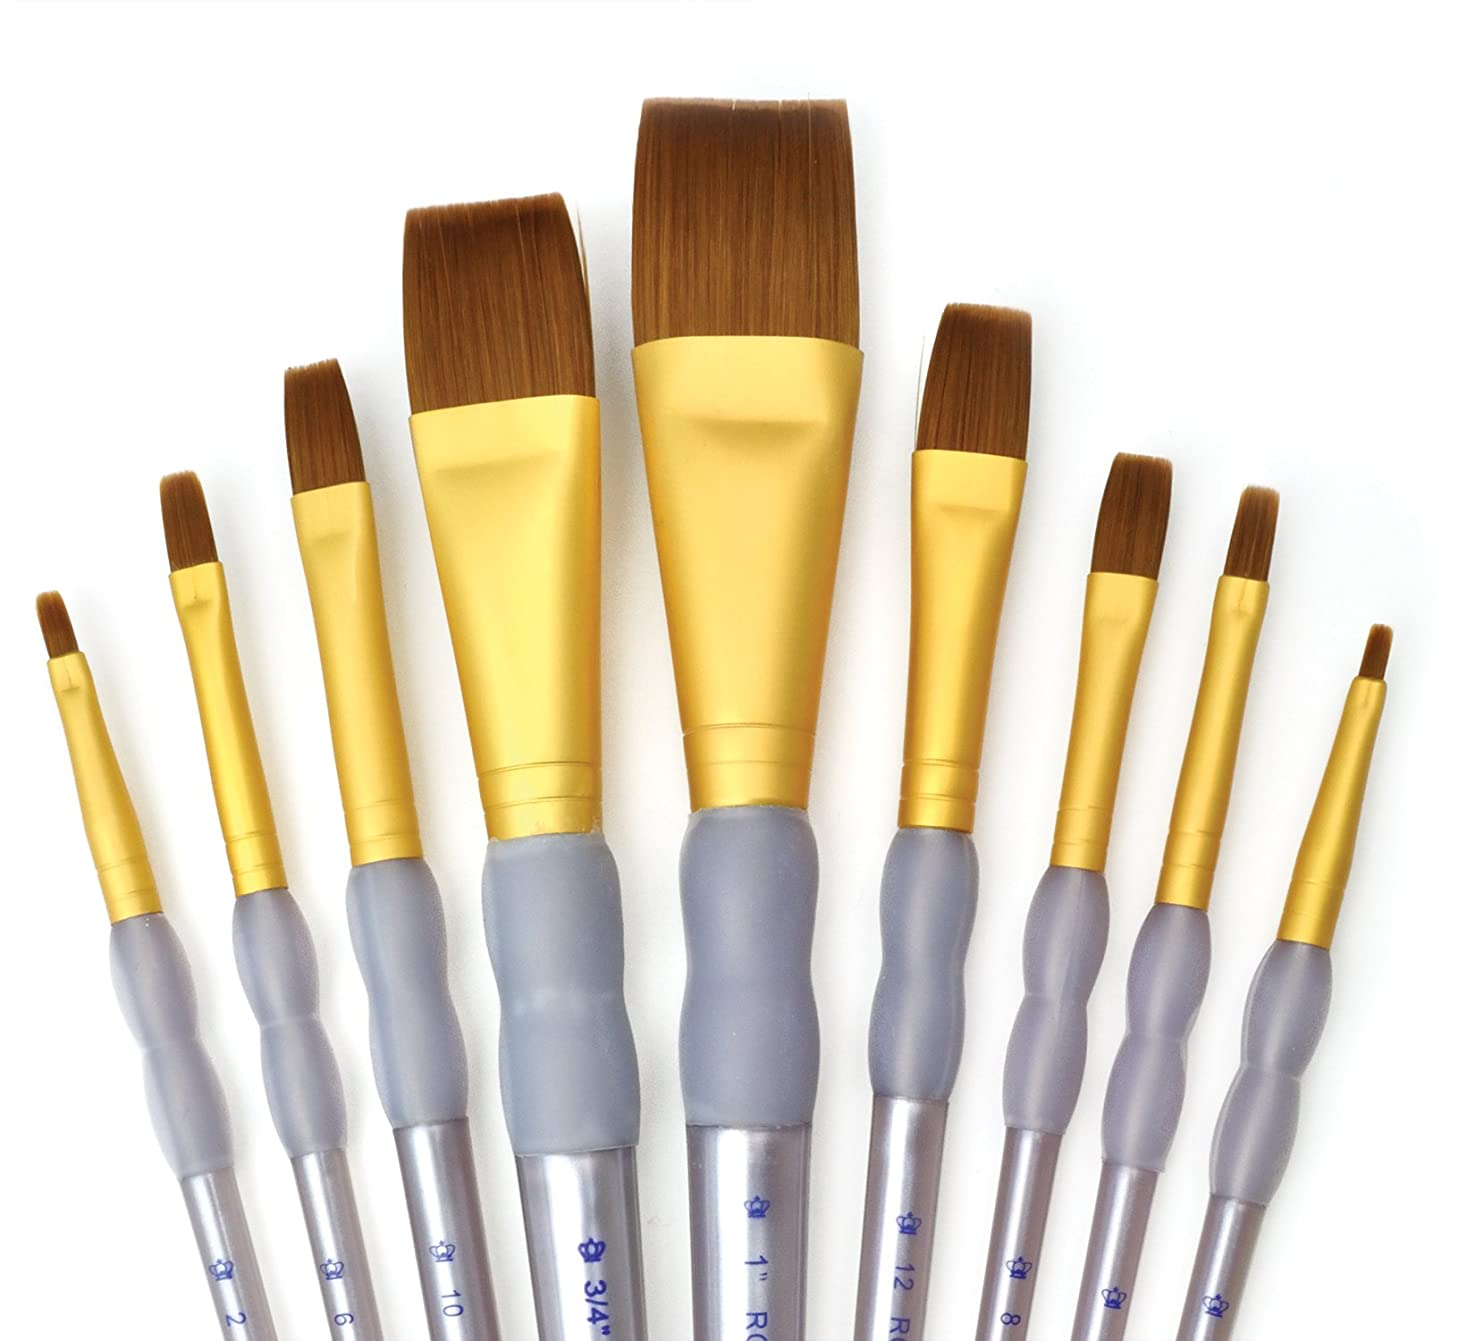 Royal and Langnickel RCC 310 Crafter's Choice Flat Taklon Variety Brush Set - Brown (Pack of 9)